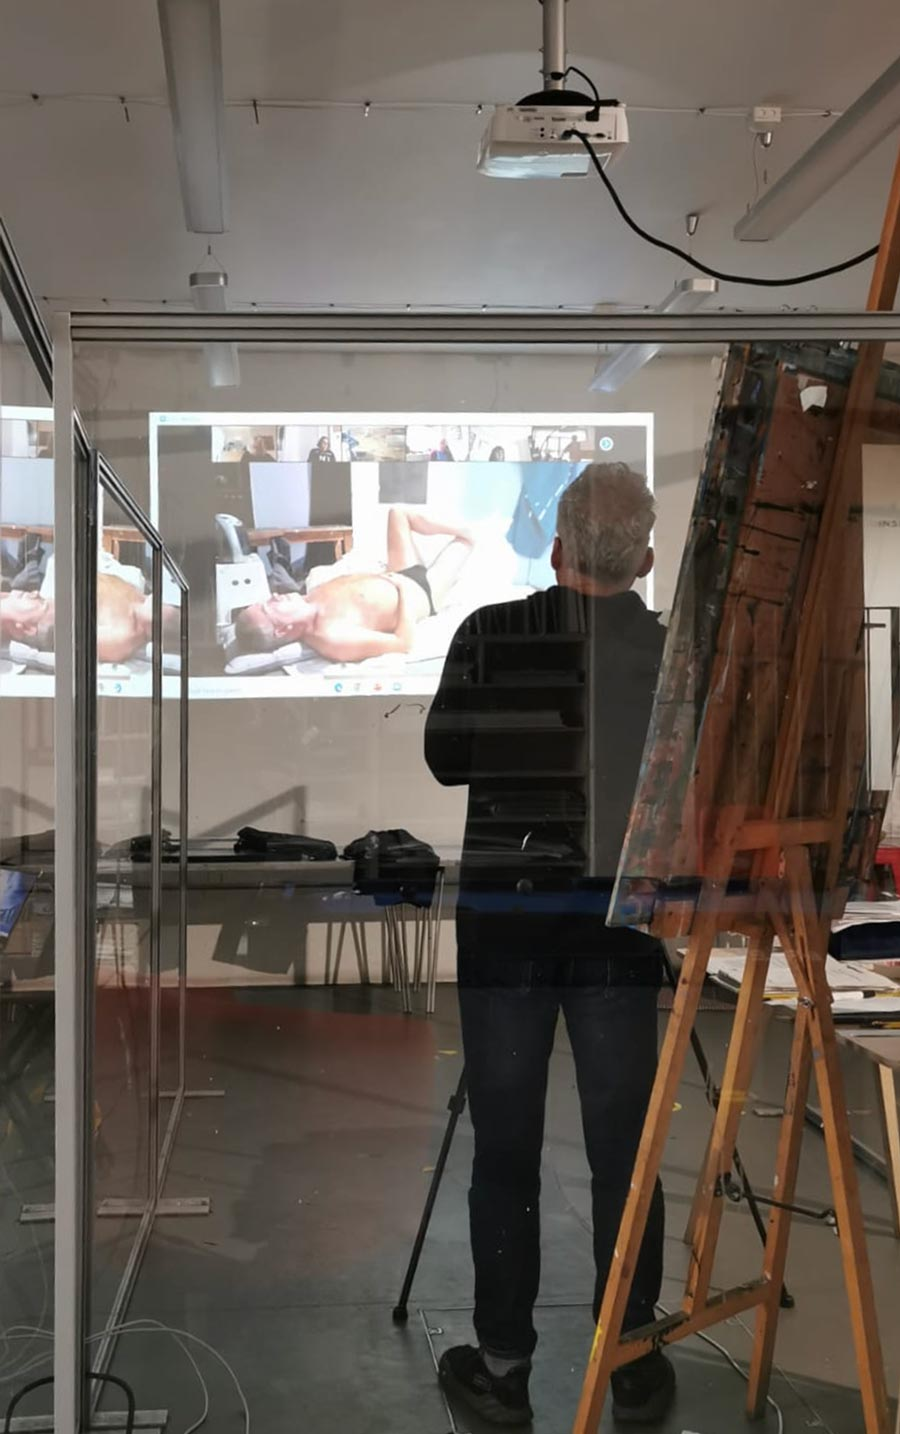 Online life drawing studio North London